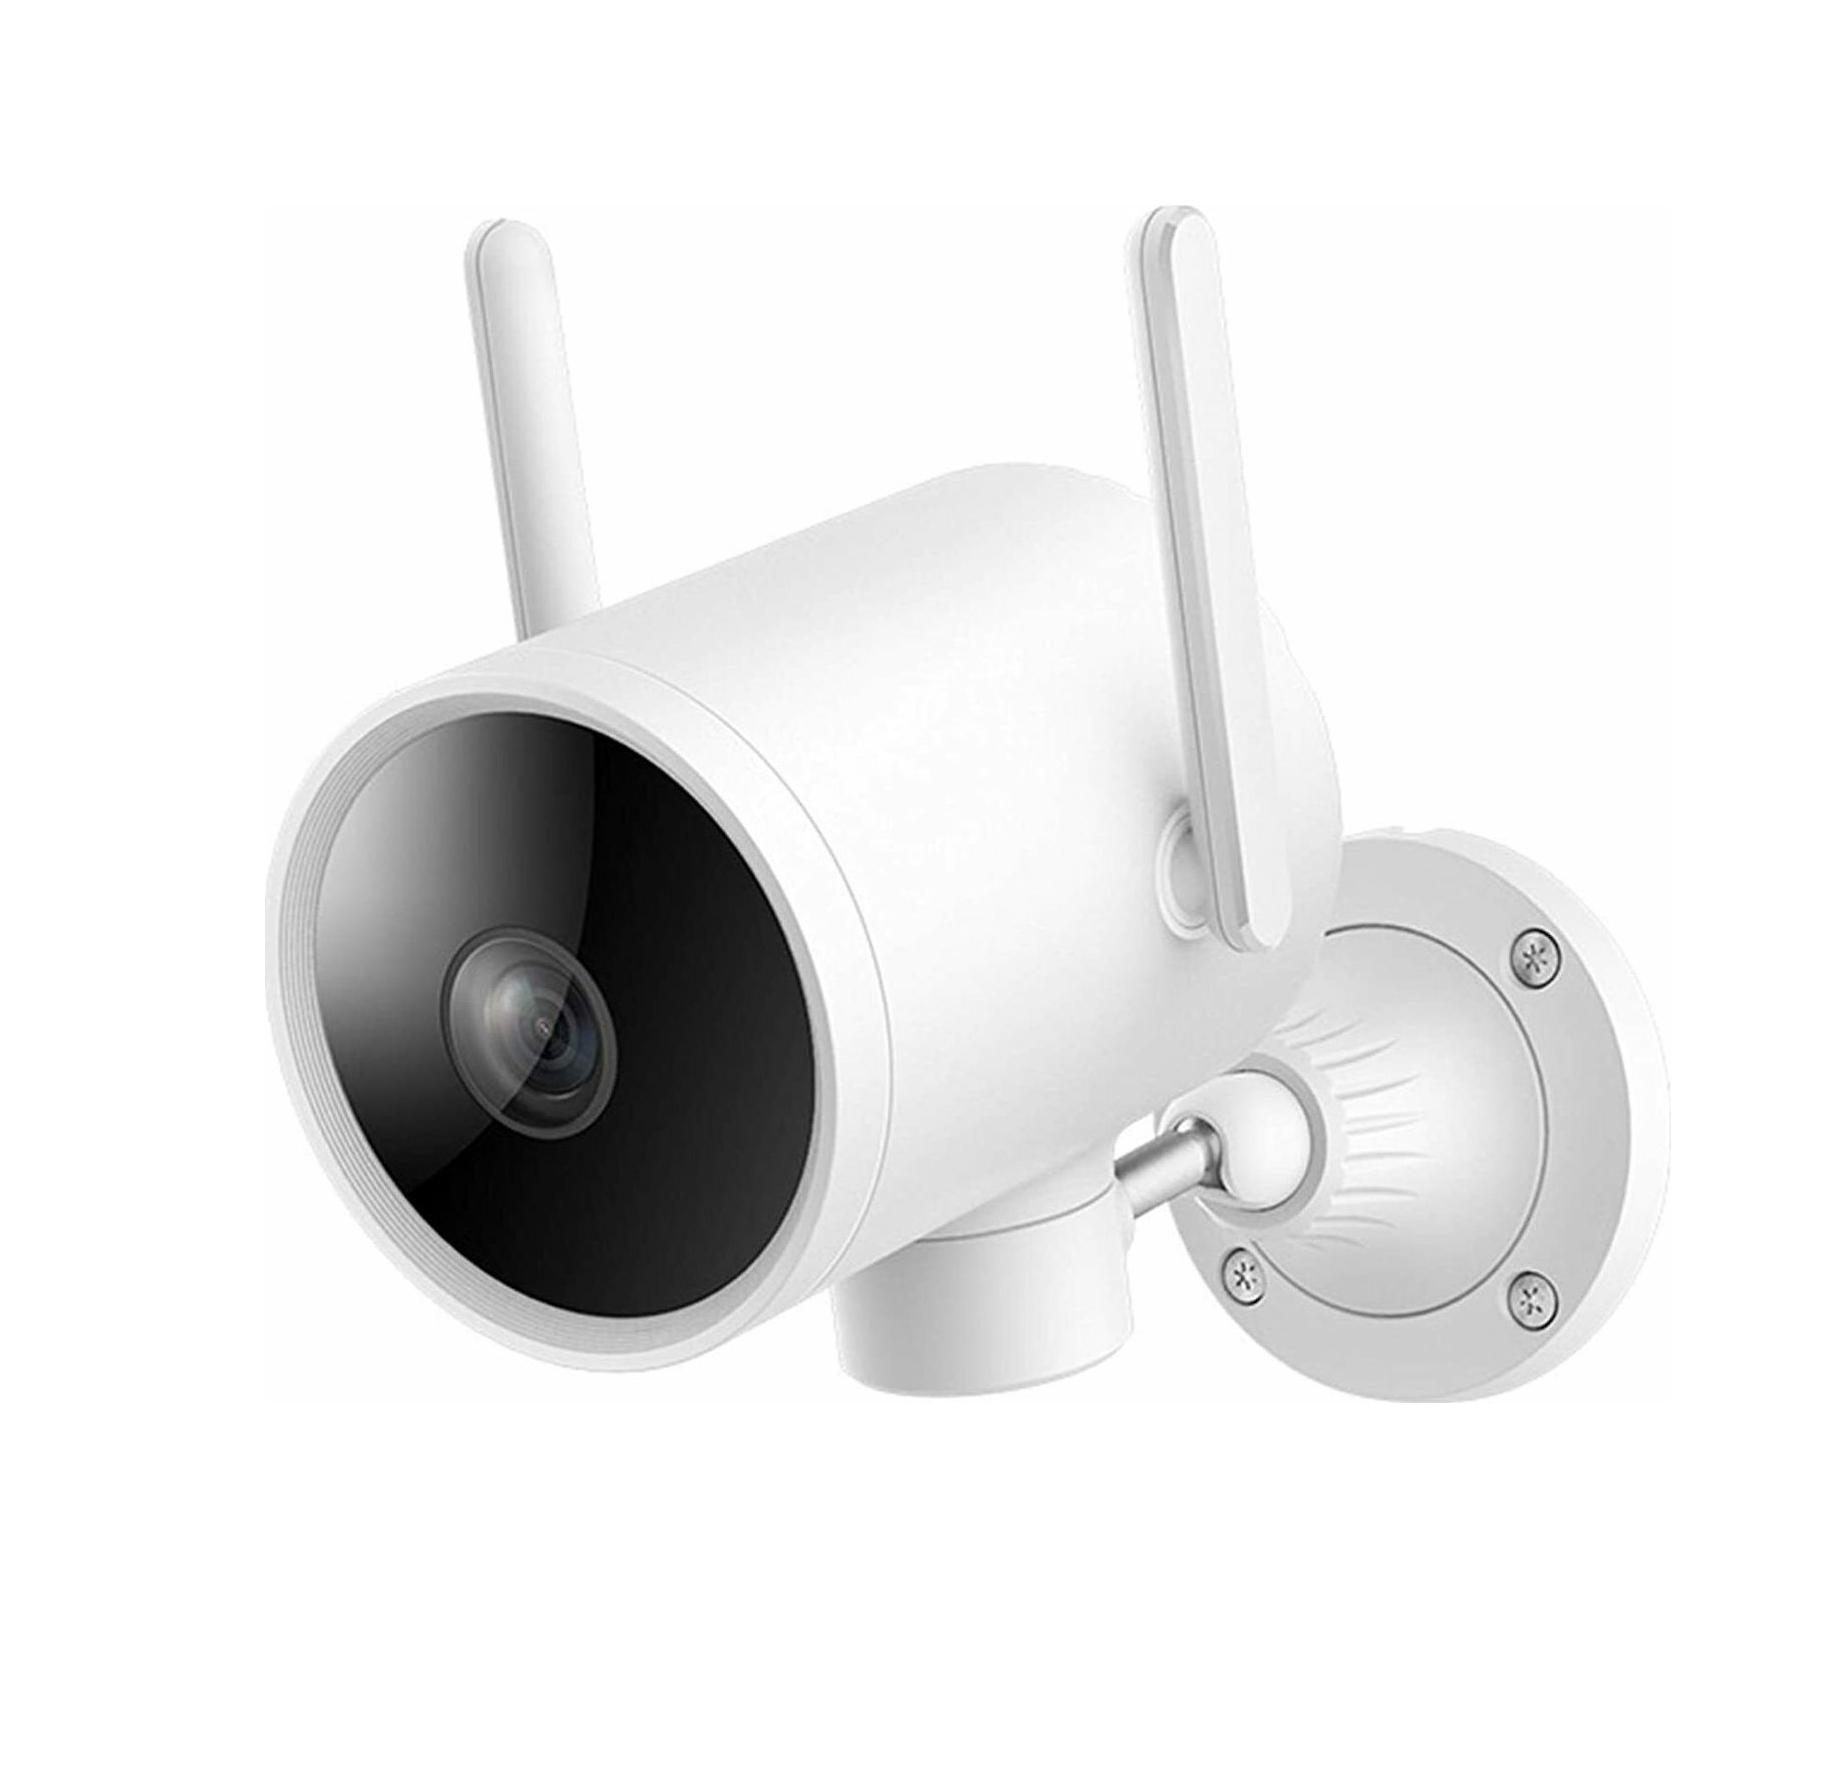 Xiaomi IP Wi-Fi Κάμερα 1080p Αδιάβροχη Security Imilab EC3 Outdoor Security Camera CMSXJ25A (2 χρόνια εγγύηση)